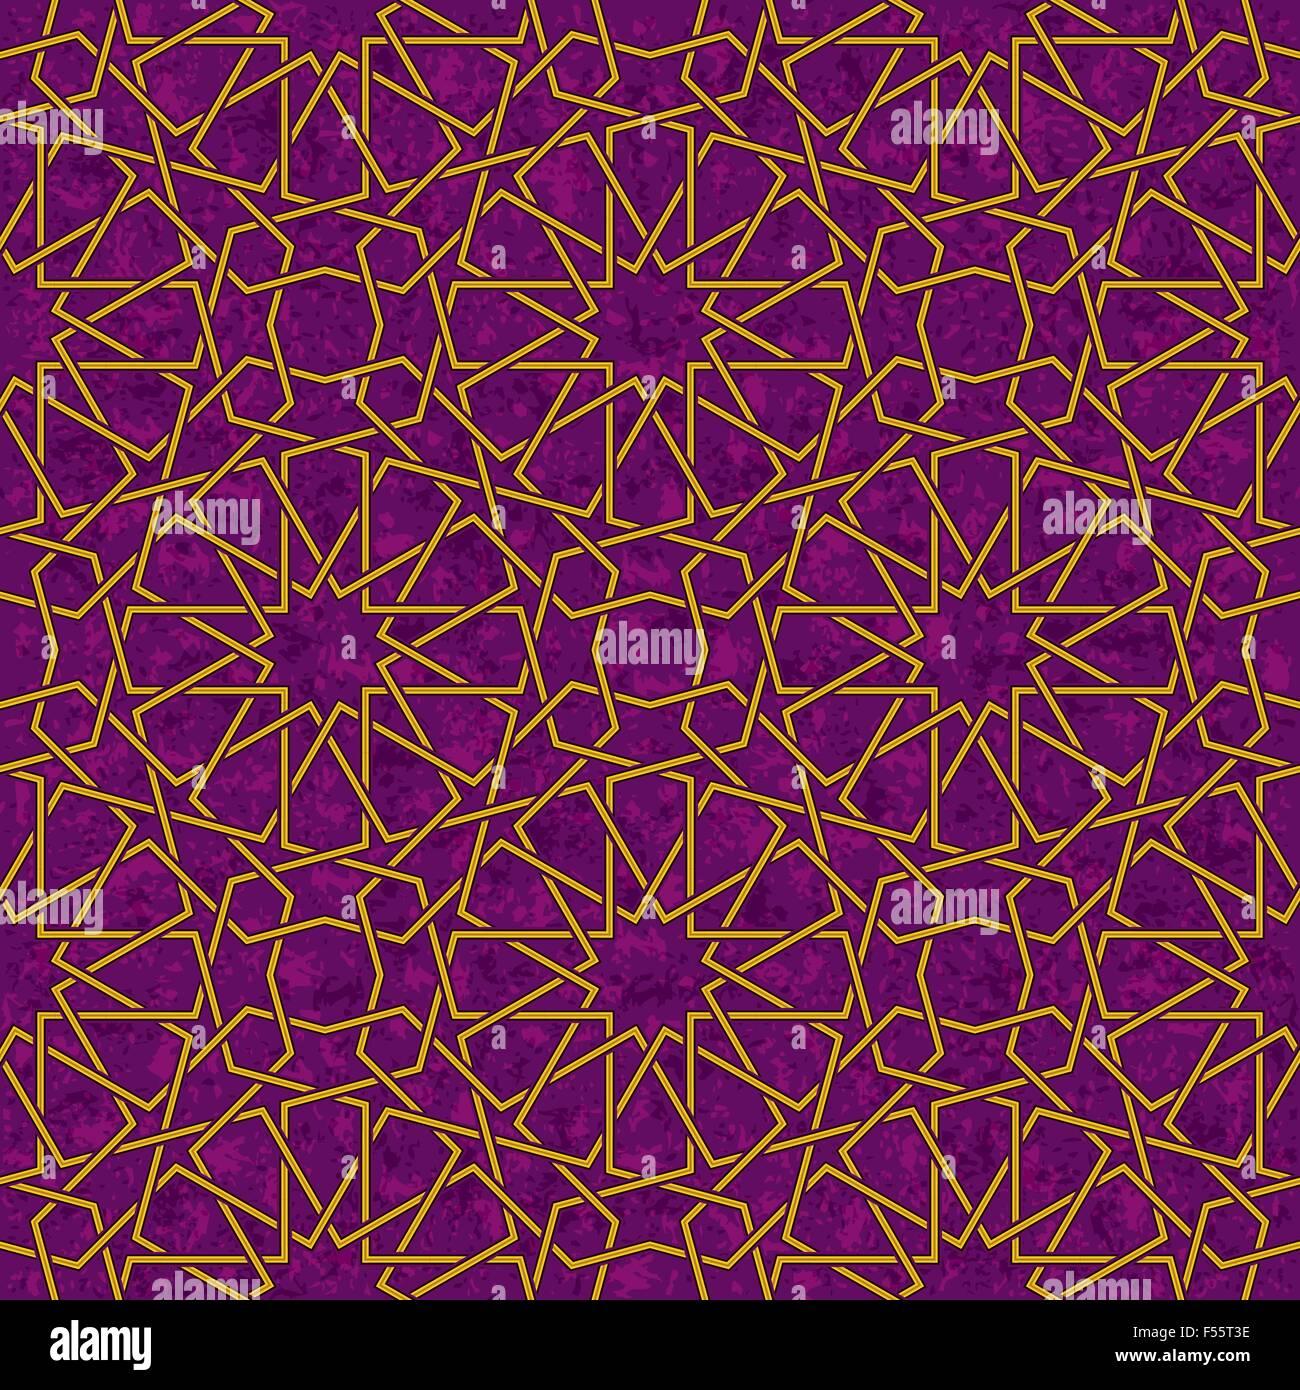 Arabesque Star Pattern with Grunge Purple Background, Vector Illustration - Stock Image